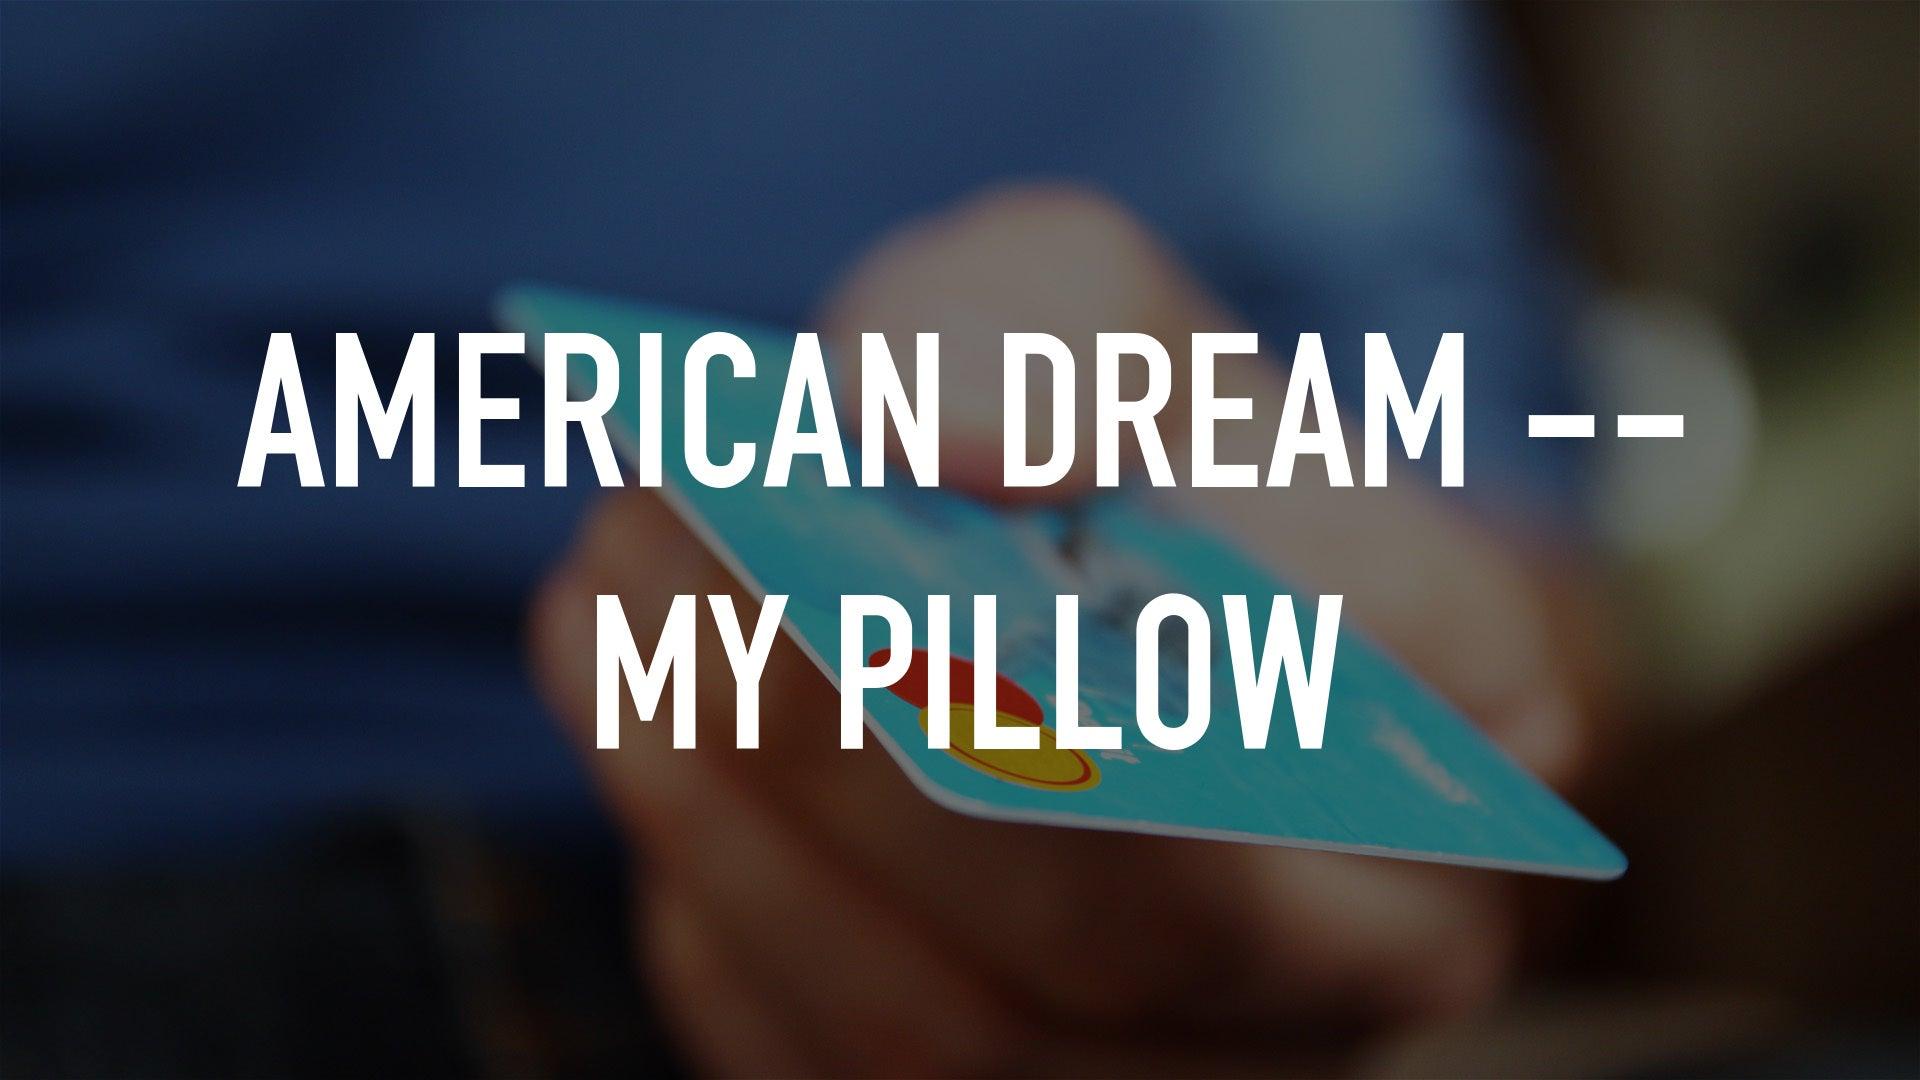 American Dream -- My Pillow